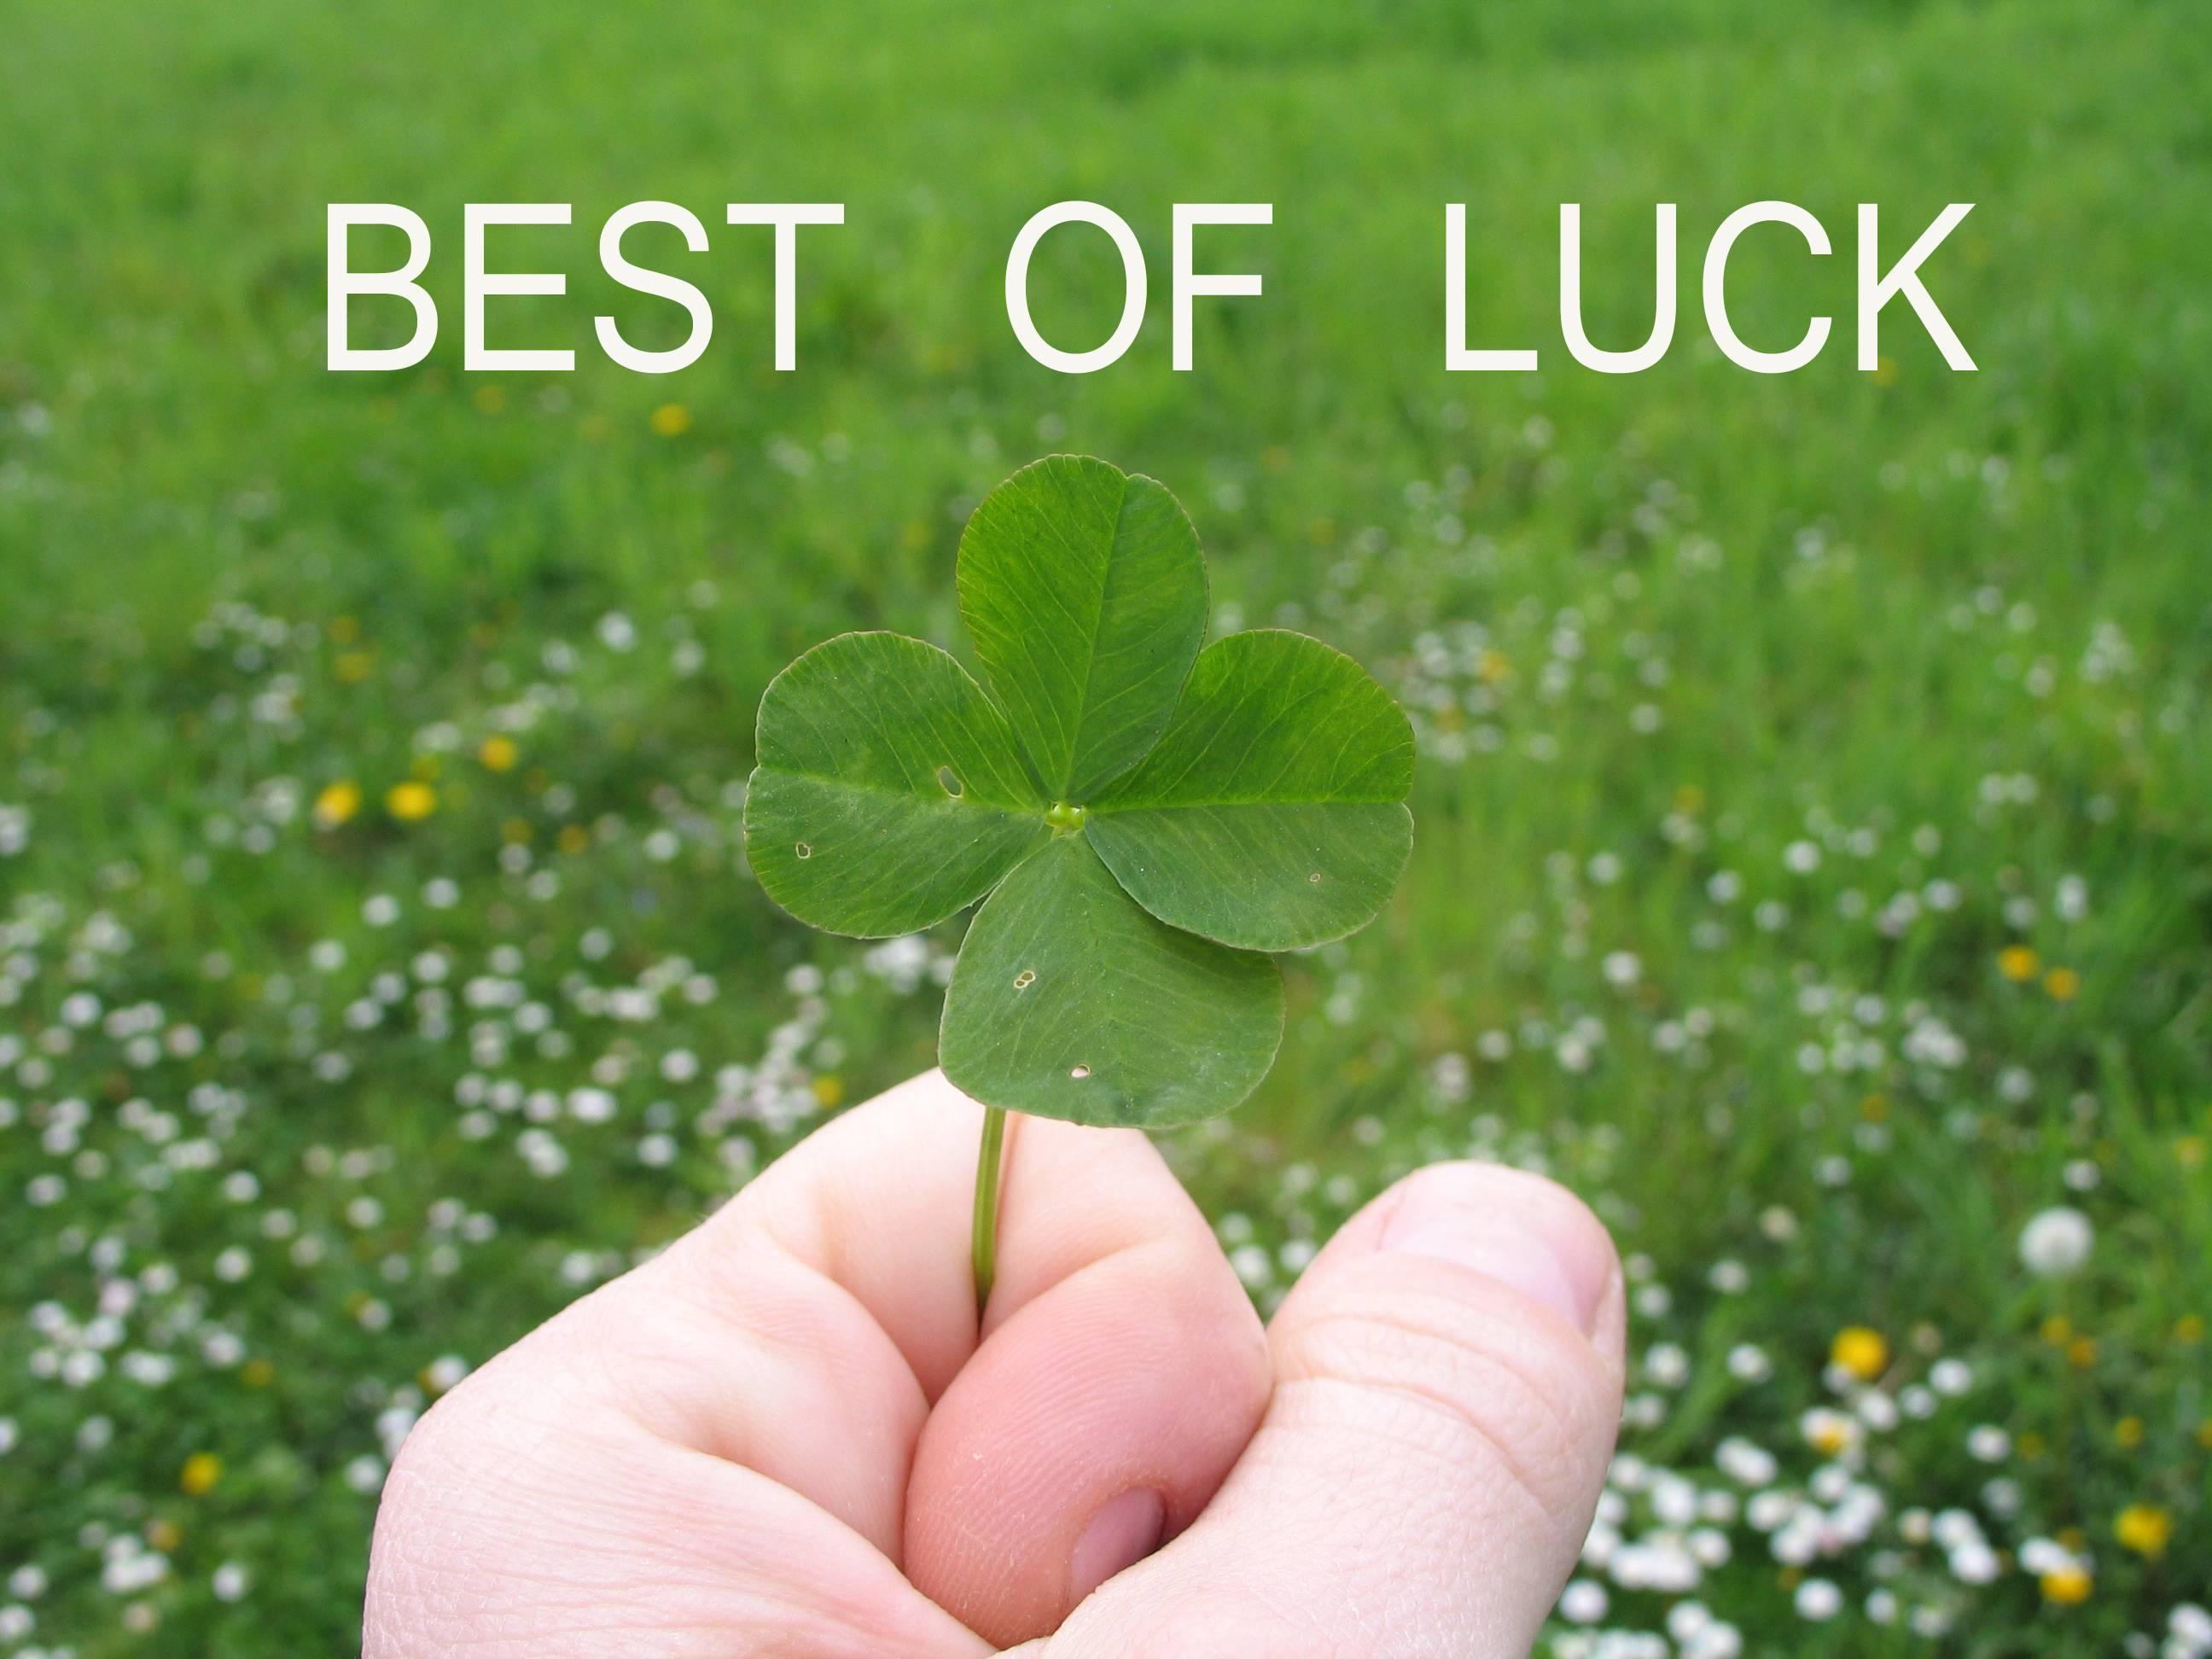 Best Of Luck Wallpapers Wallpaper Cave